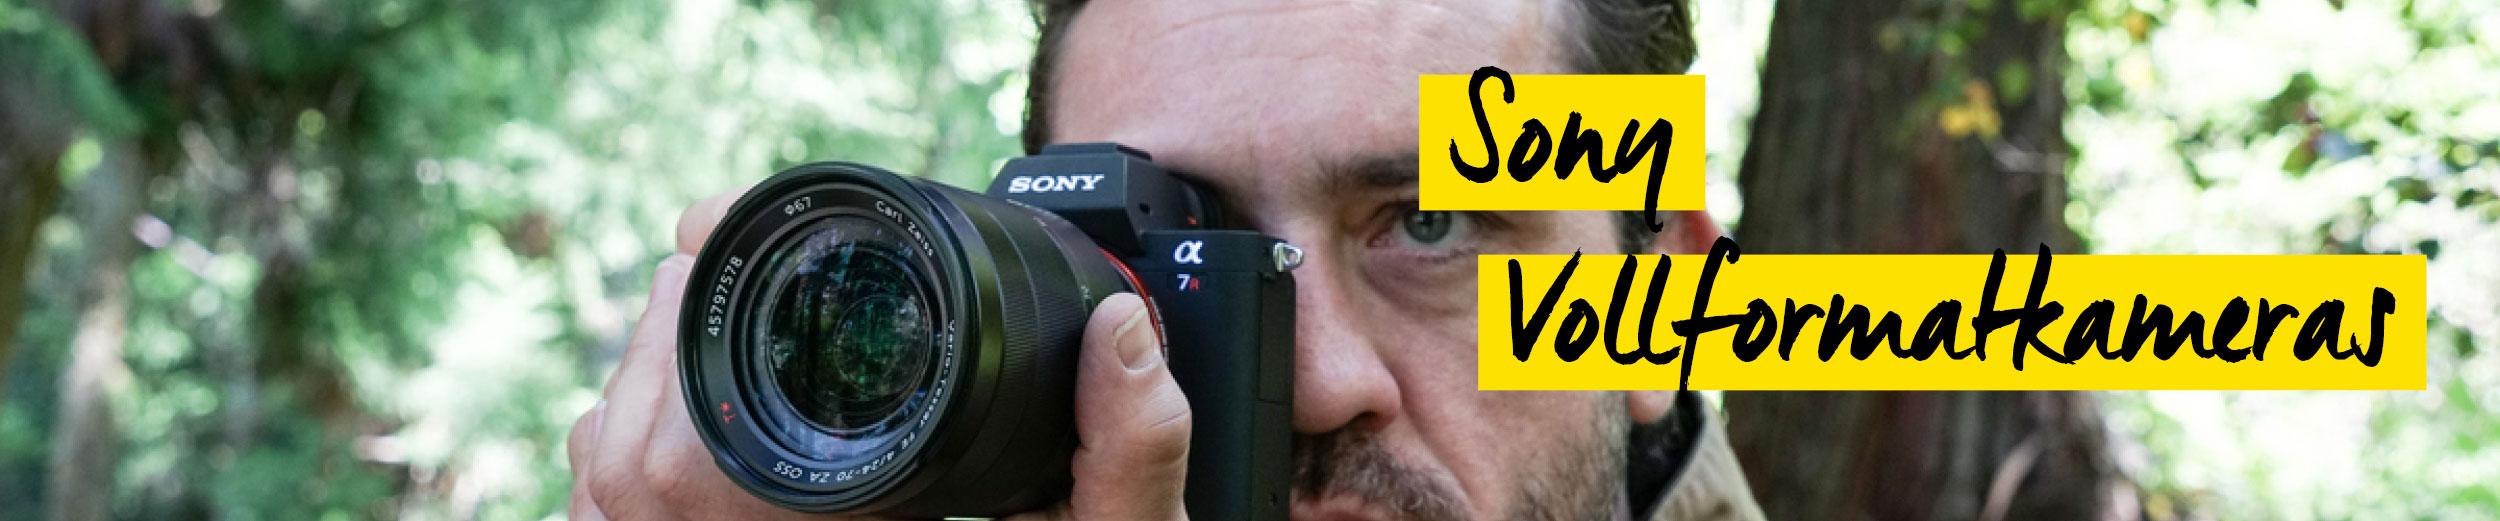 Sony Vollformatkameras